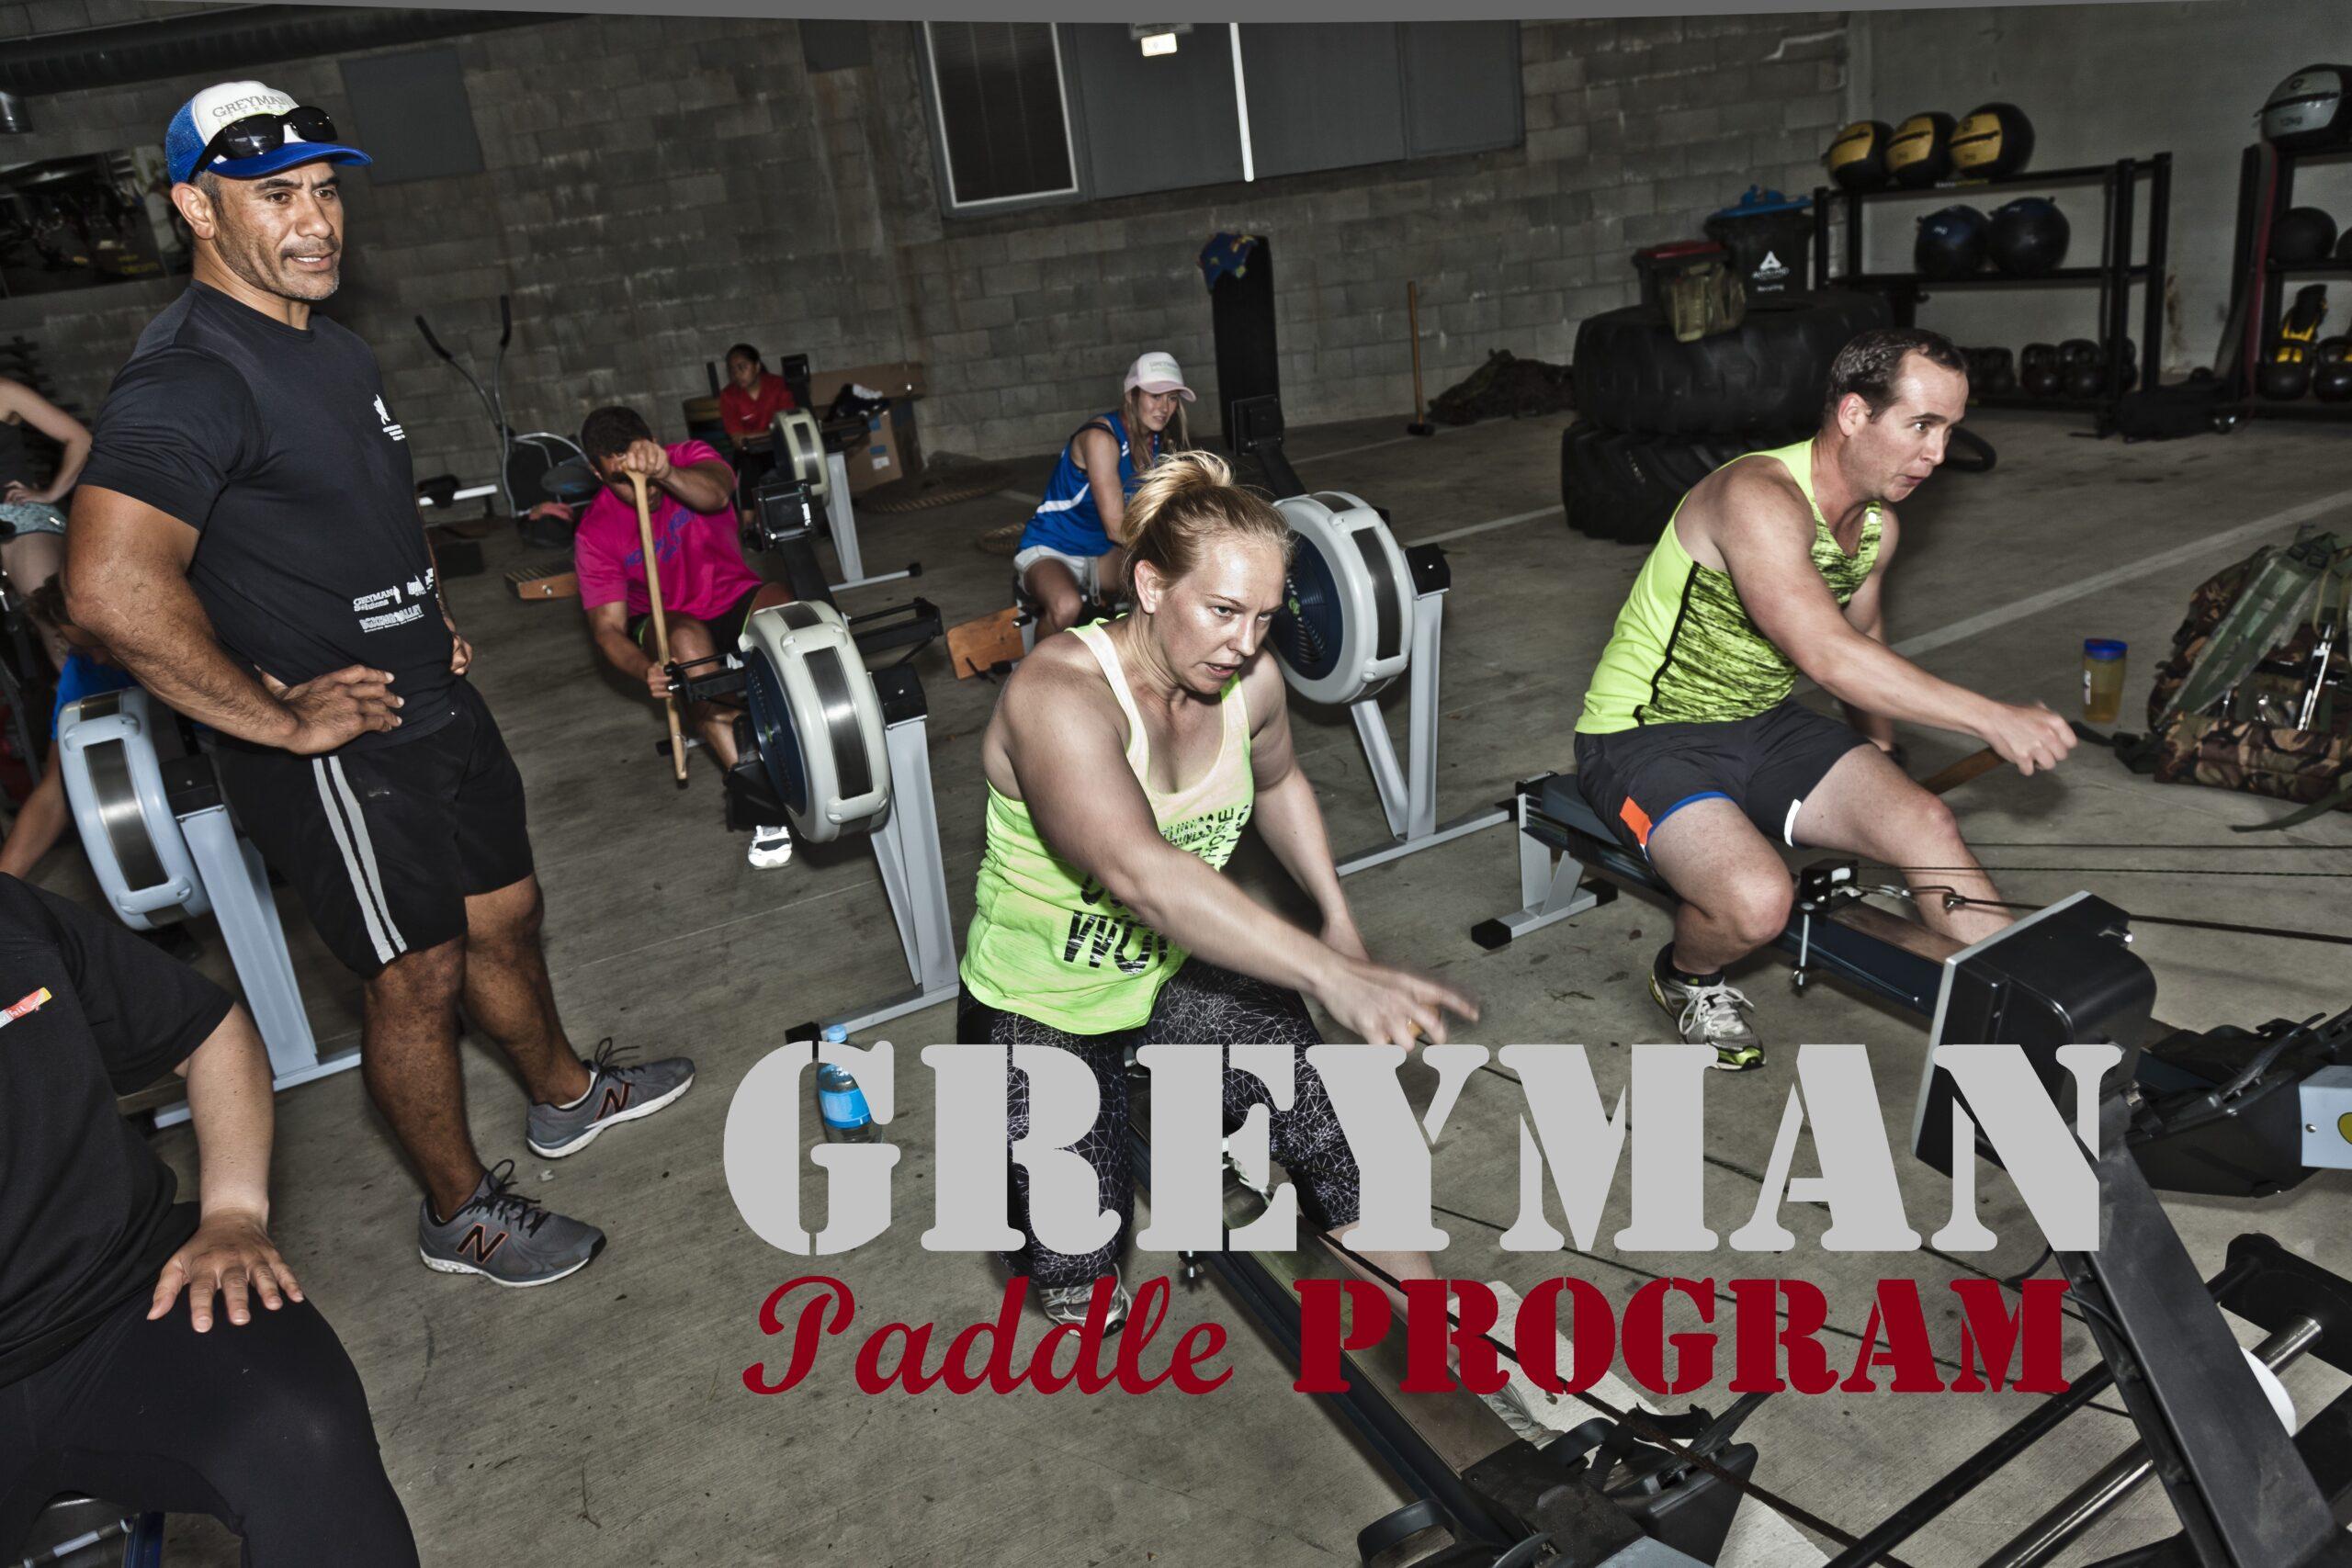 GREYMAN PaddleProgram